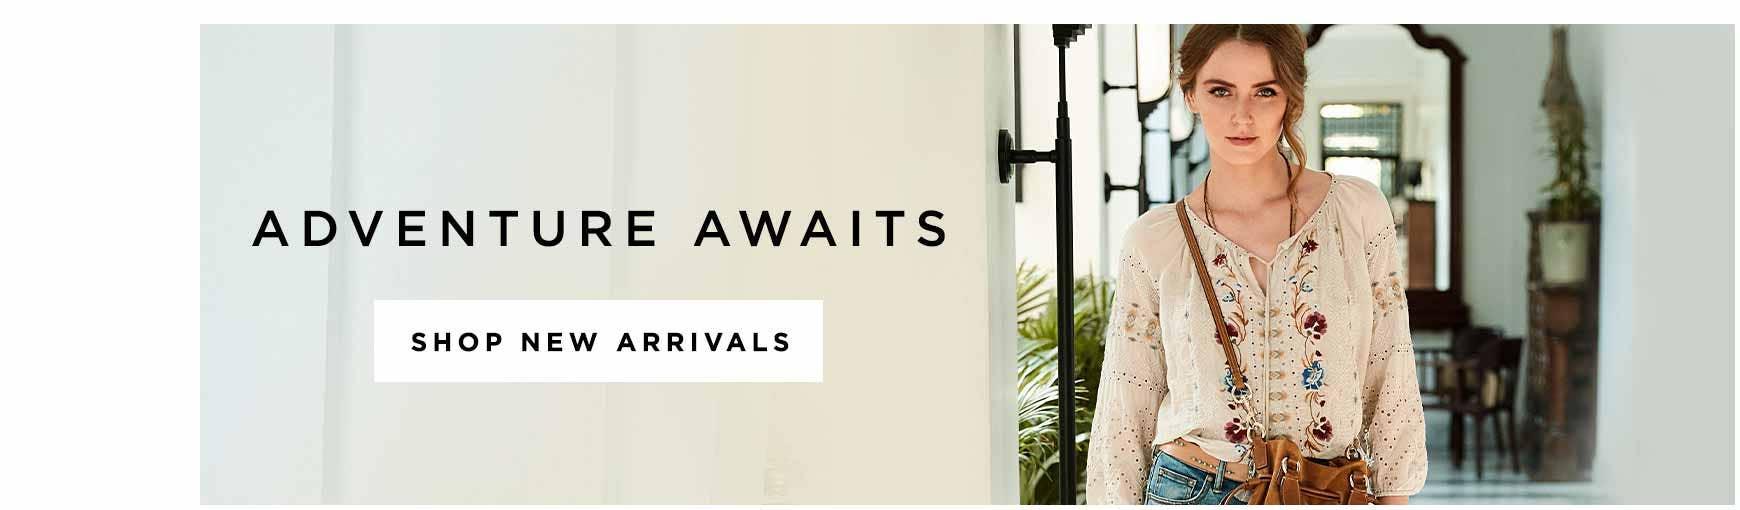 Adventure Awaits - Shop New Arrivals